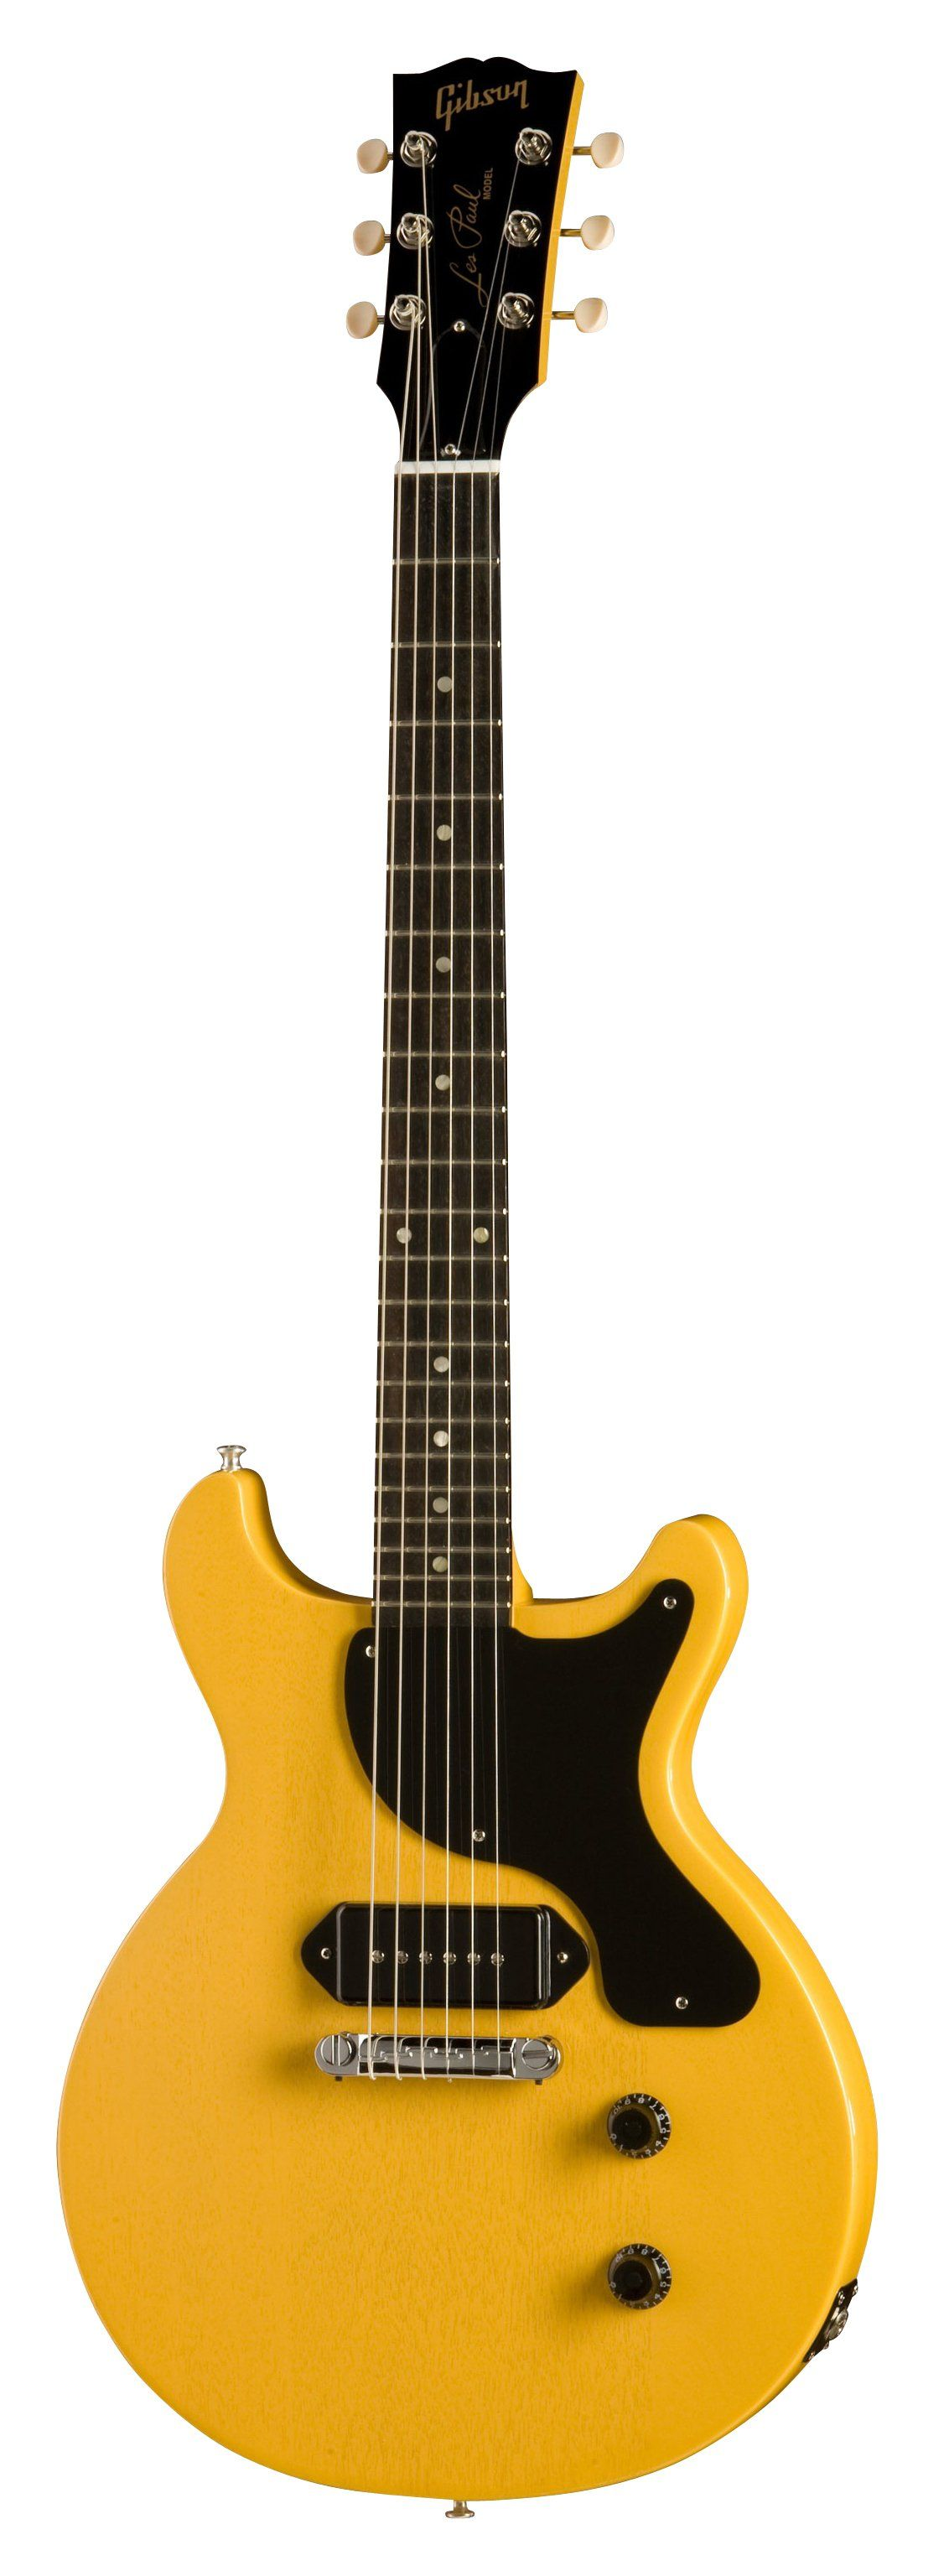 Vintage gibson les paul jr. guitarras para la venta